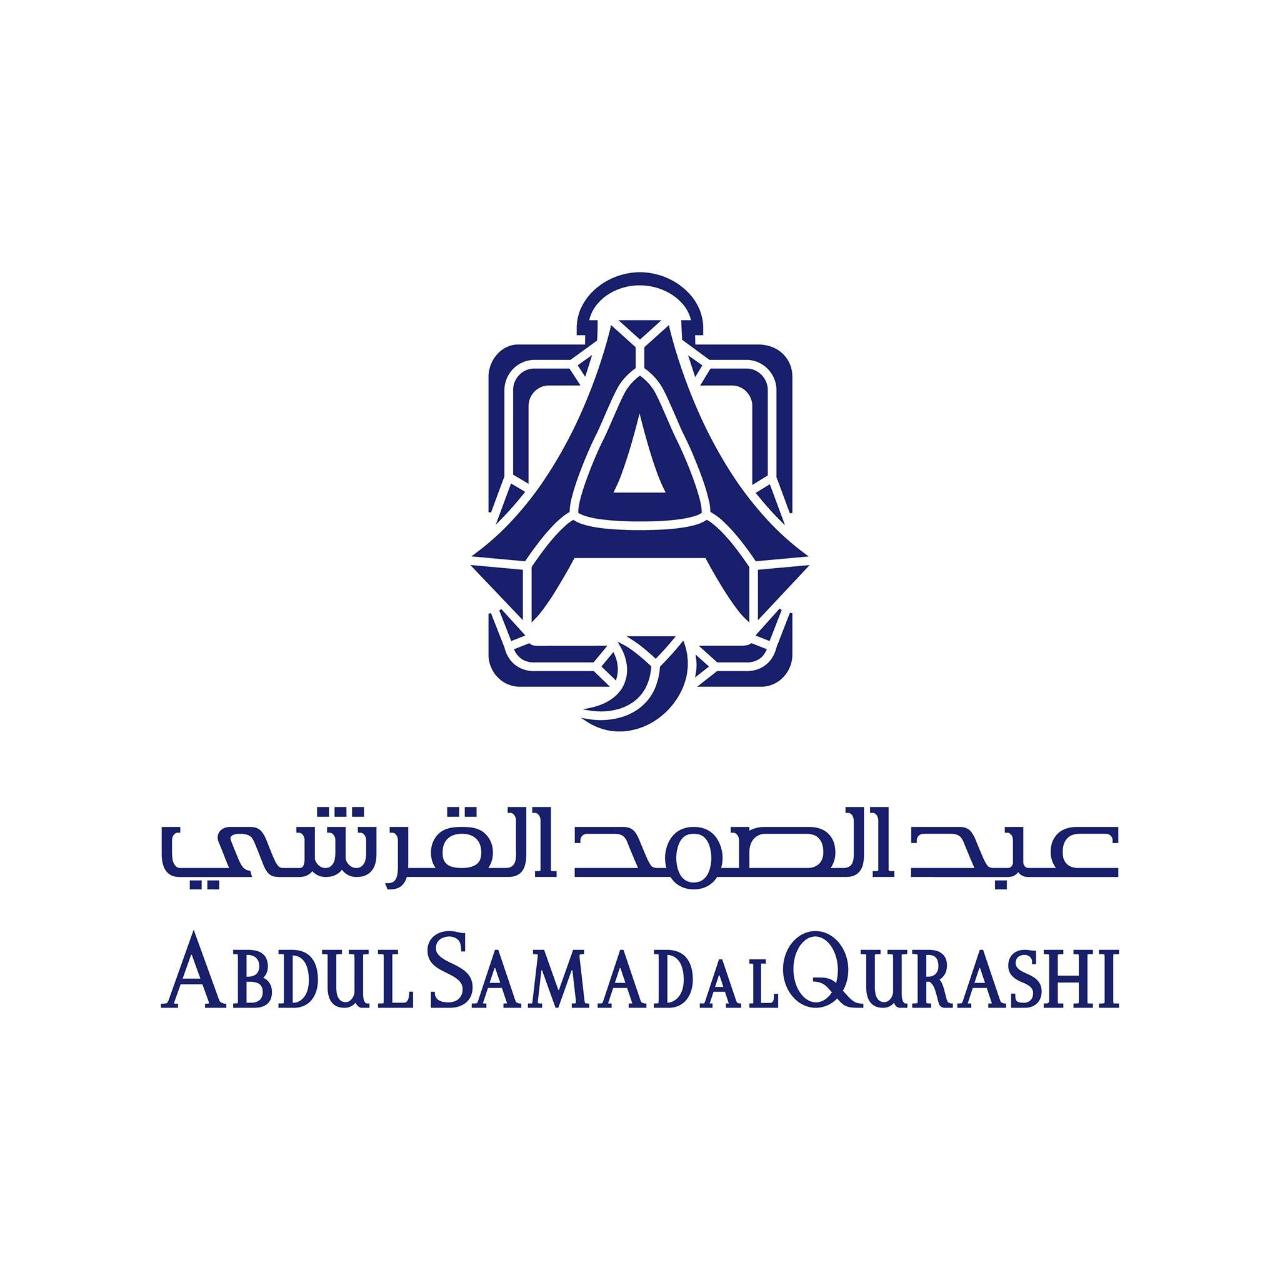 Abdulsamad